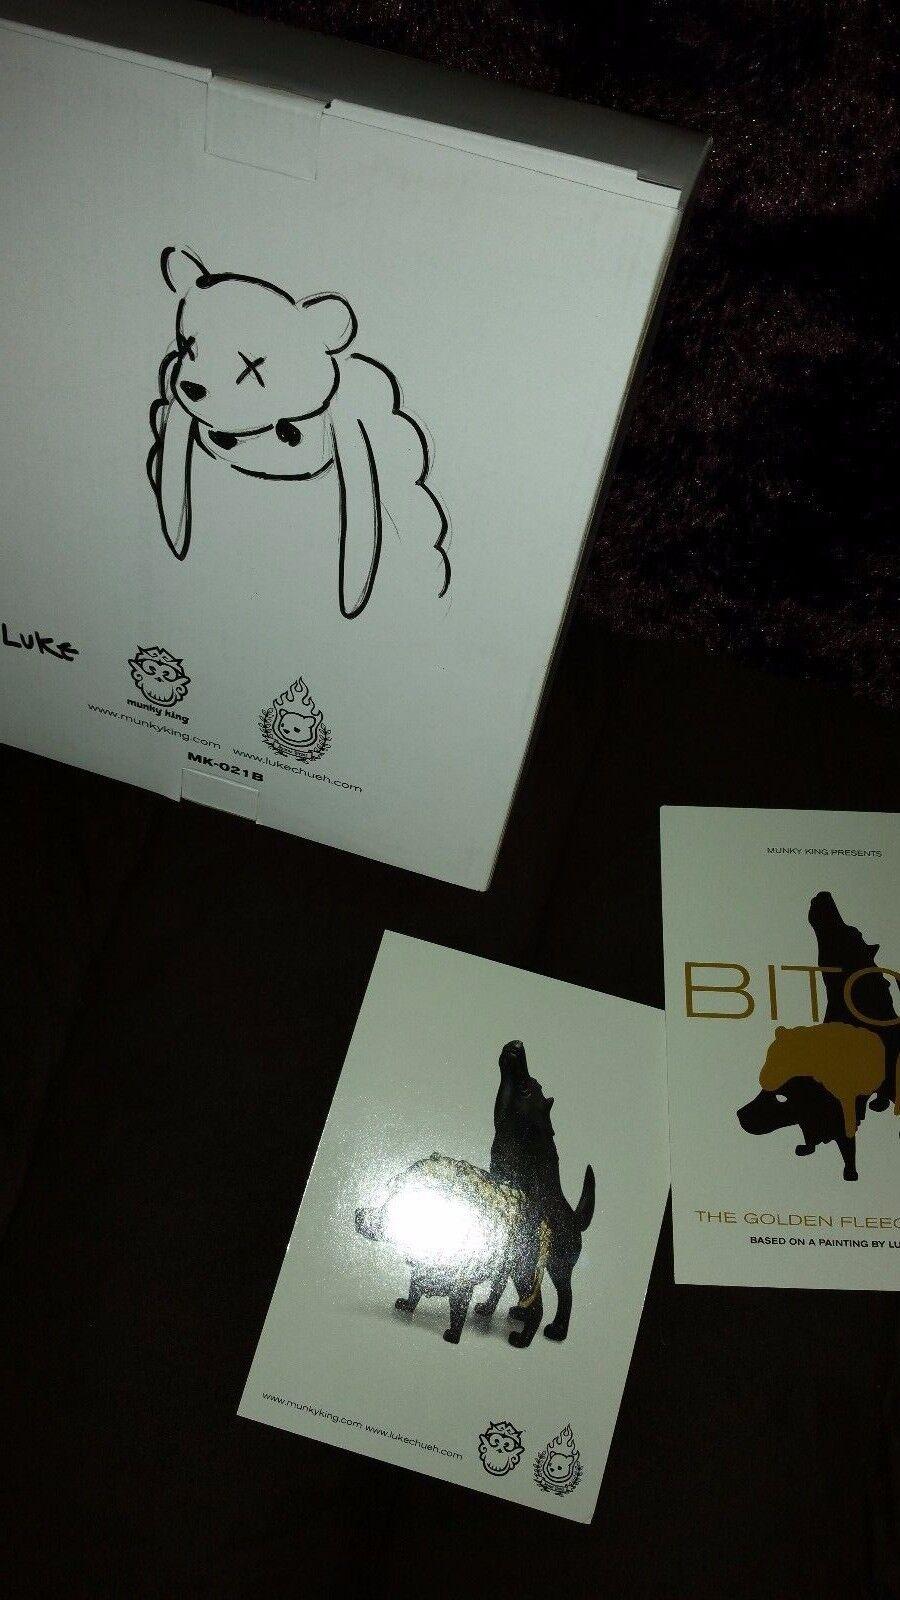 Luke Chueh BITCH gold Fleece Fleece Fleece Exclusive SDCC 2014 Munky King + 2 PC 150 Ed SIGNED 2a4e93